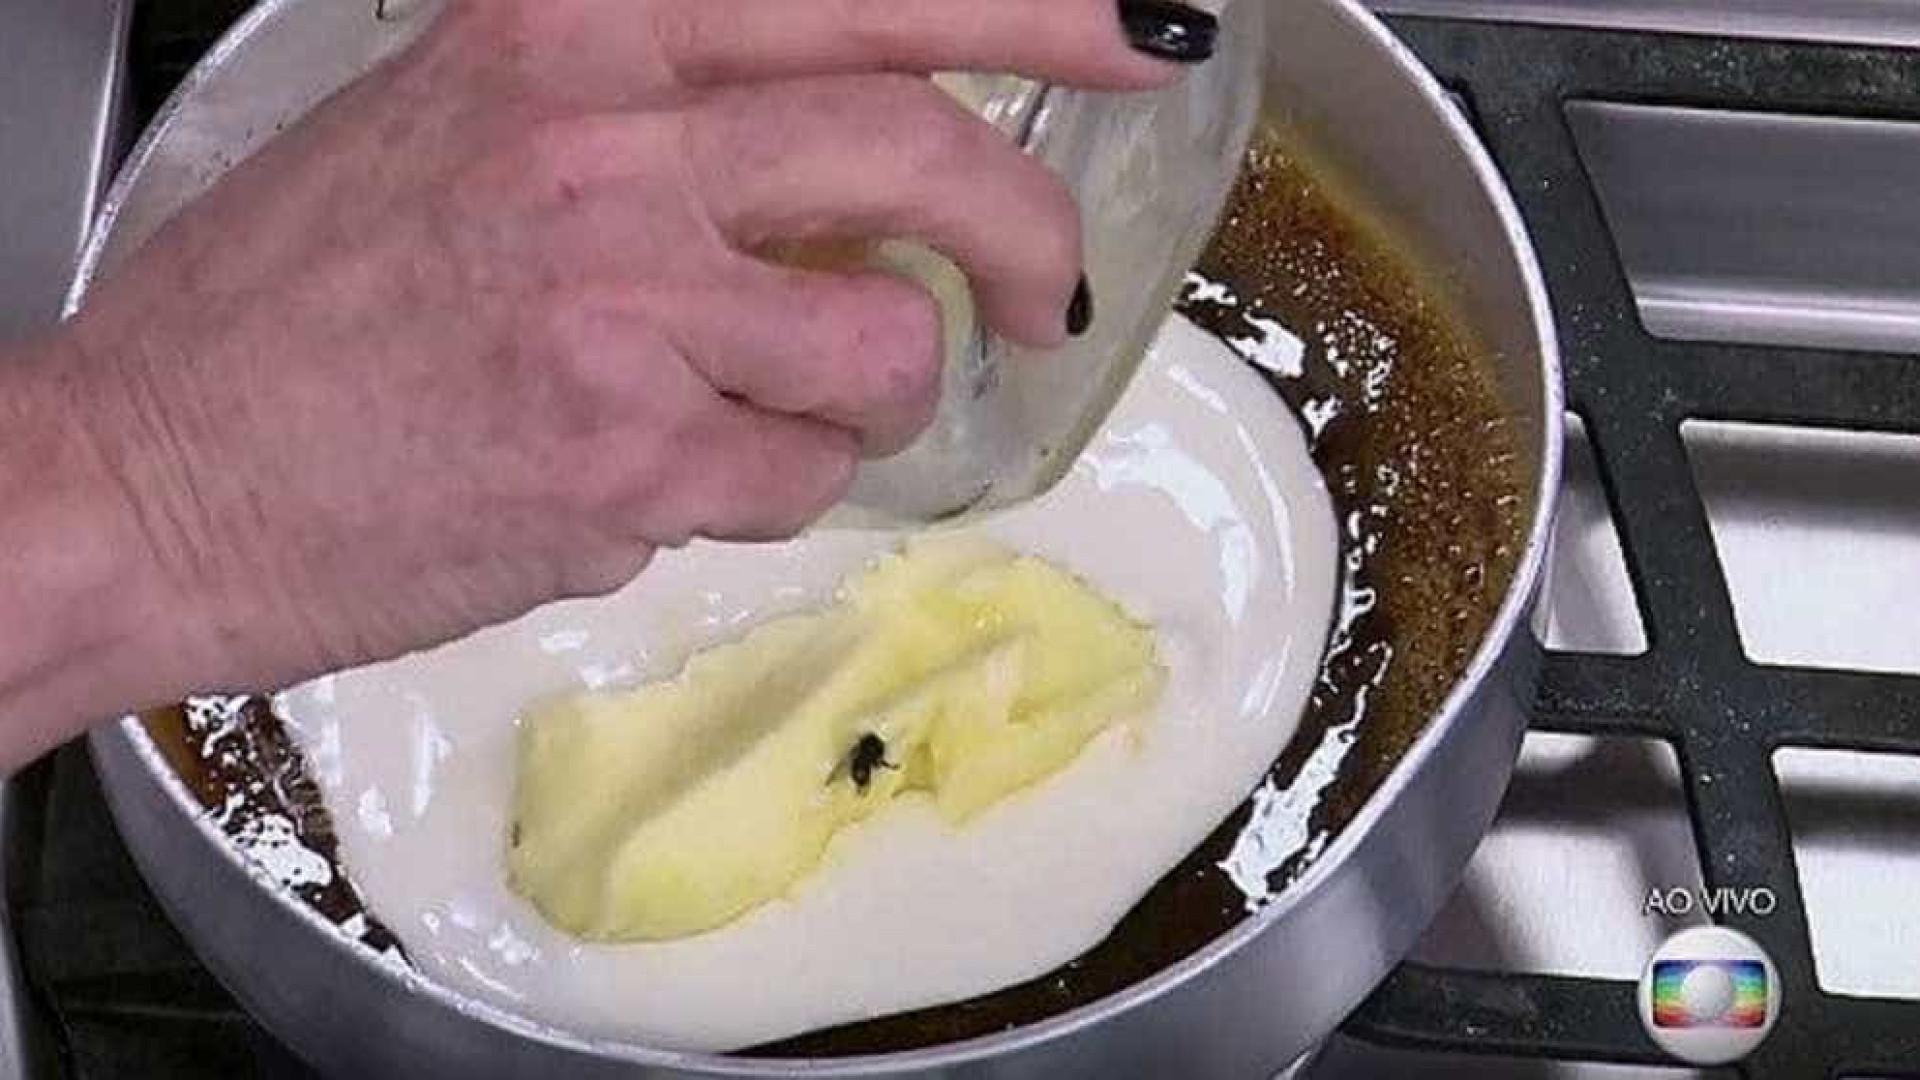 Ana Maria Braga prepara prato com mosca e causa polêmica na web